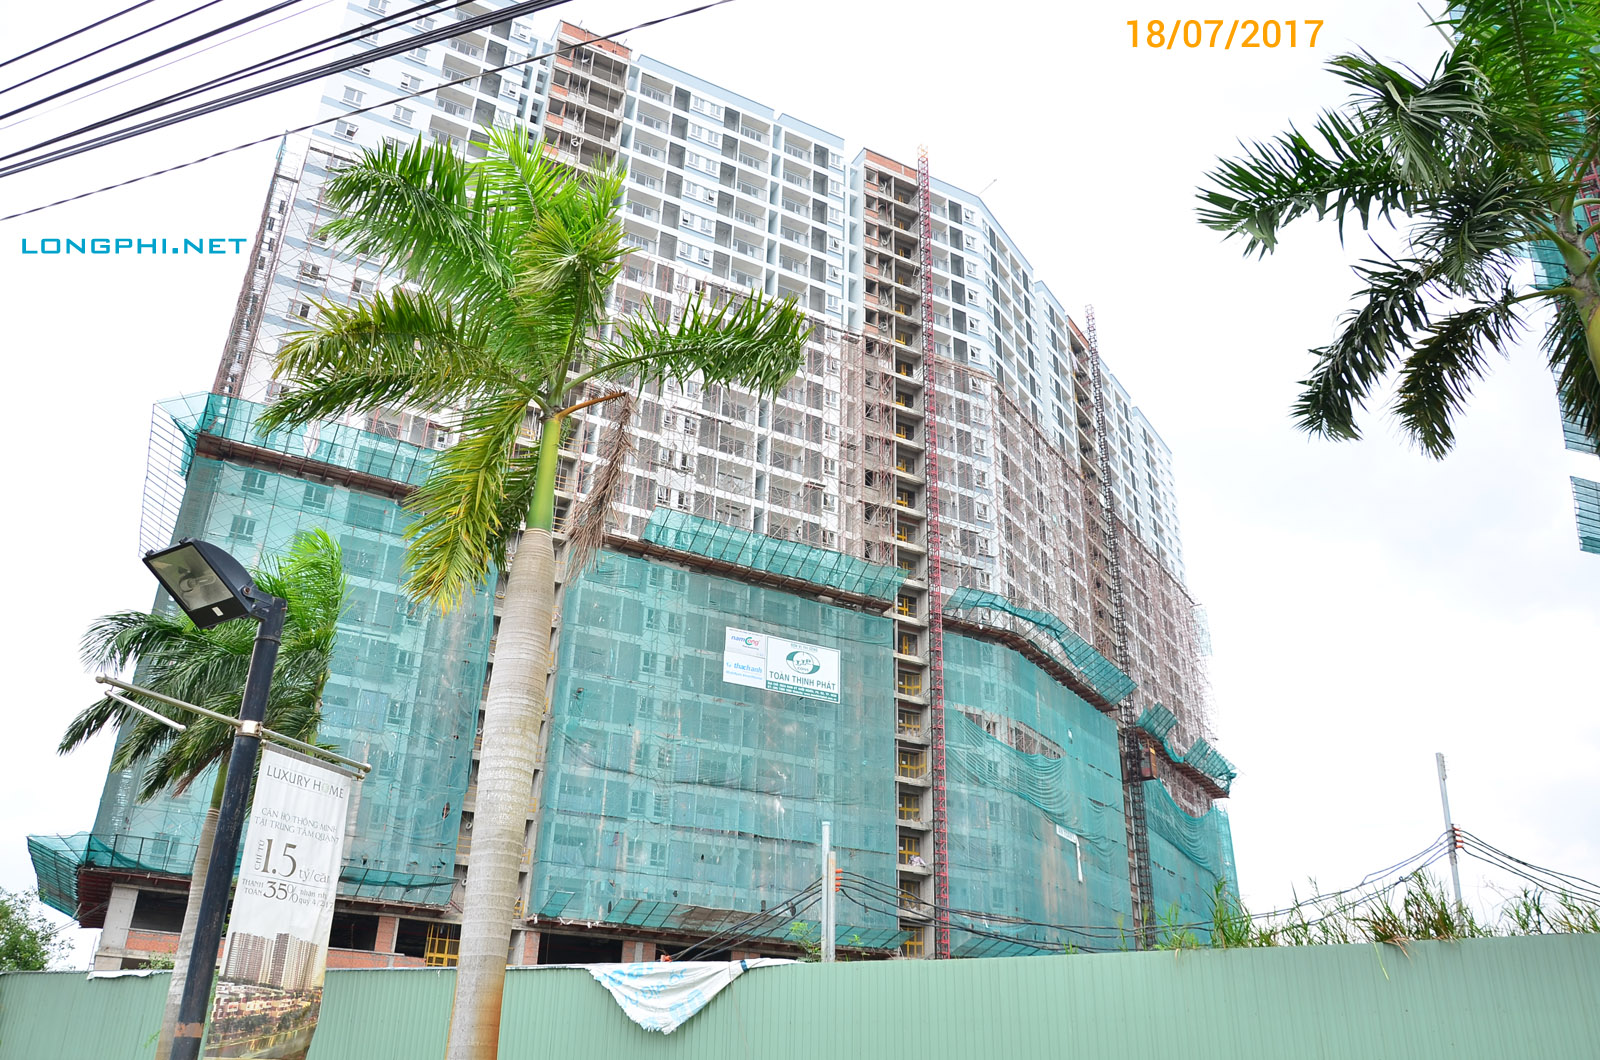 Jamona Apartment - Tháp Nam - Mặt trong.